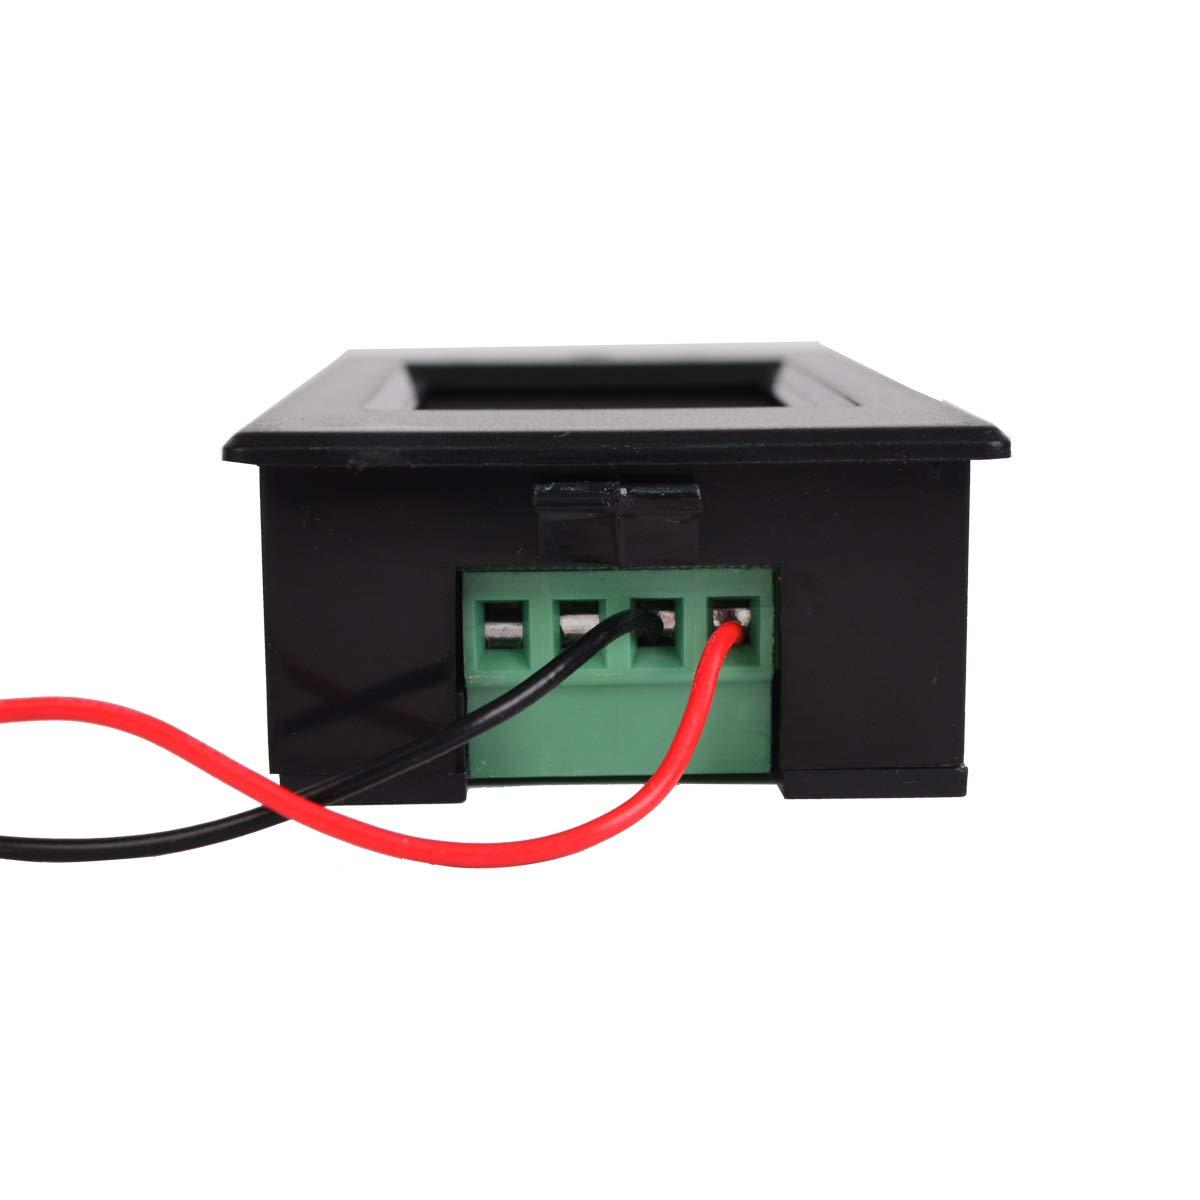 Baitaihem AC 80-260V 100A LCD Display Digital Current Voltage Power Energy Meter Multimeter Ammeter Voltmeter by Baitaihem (Image #6)